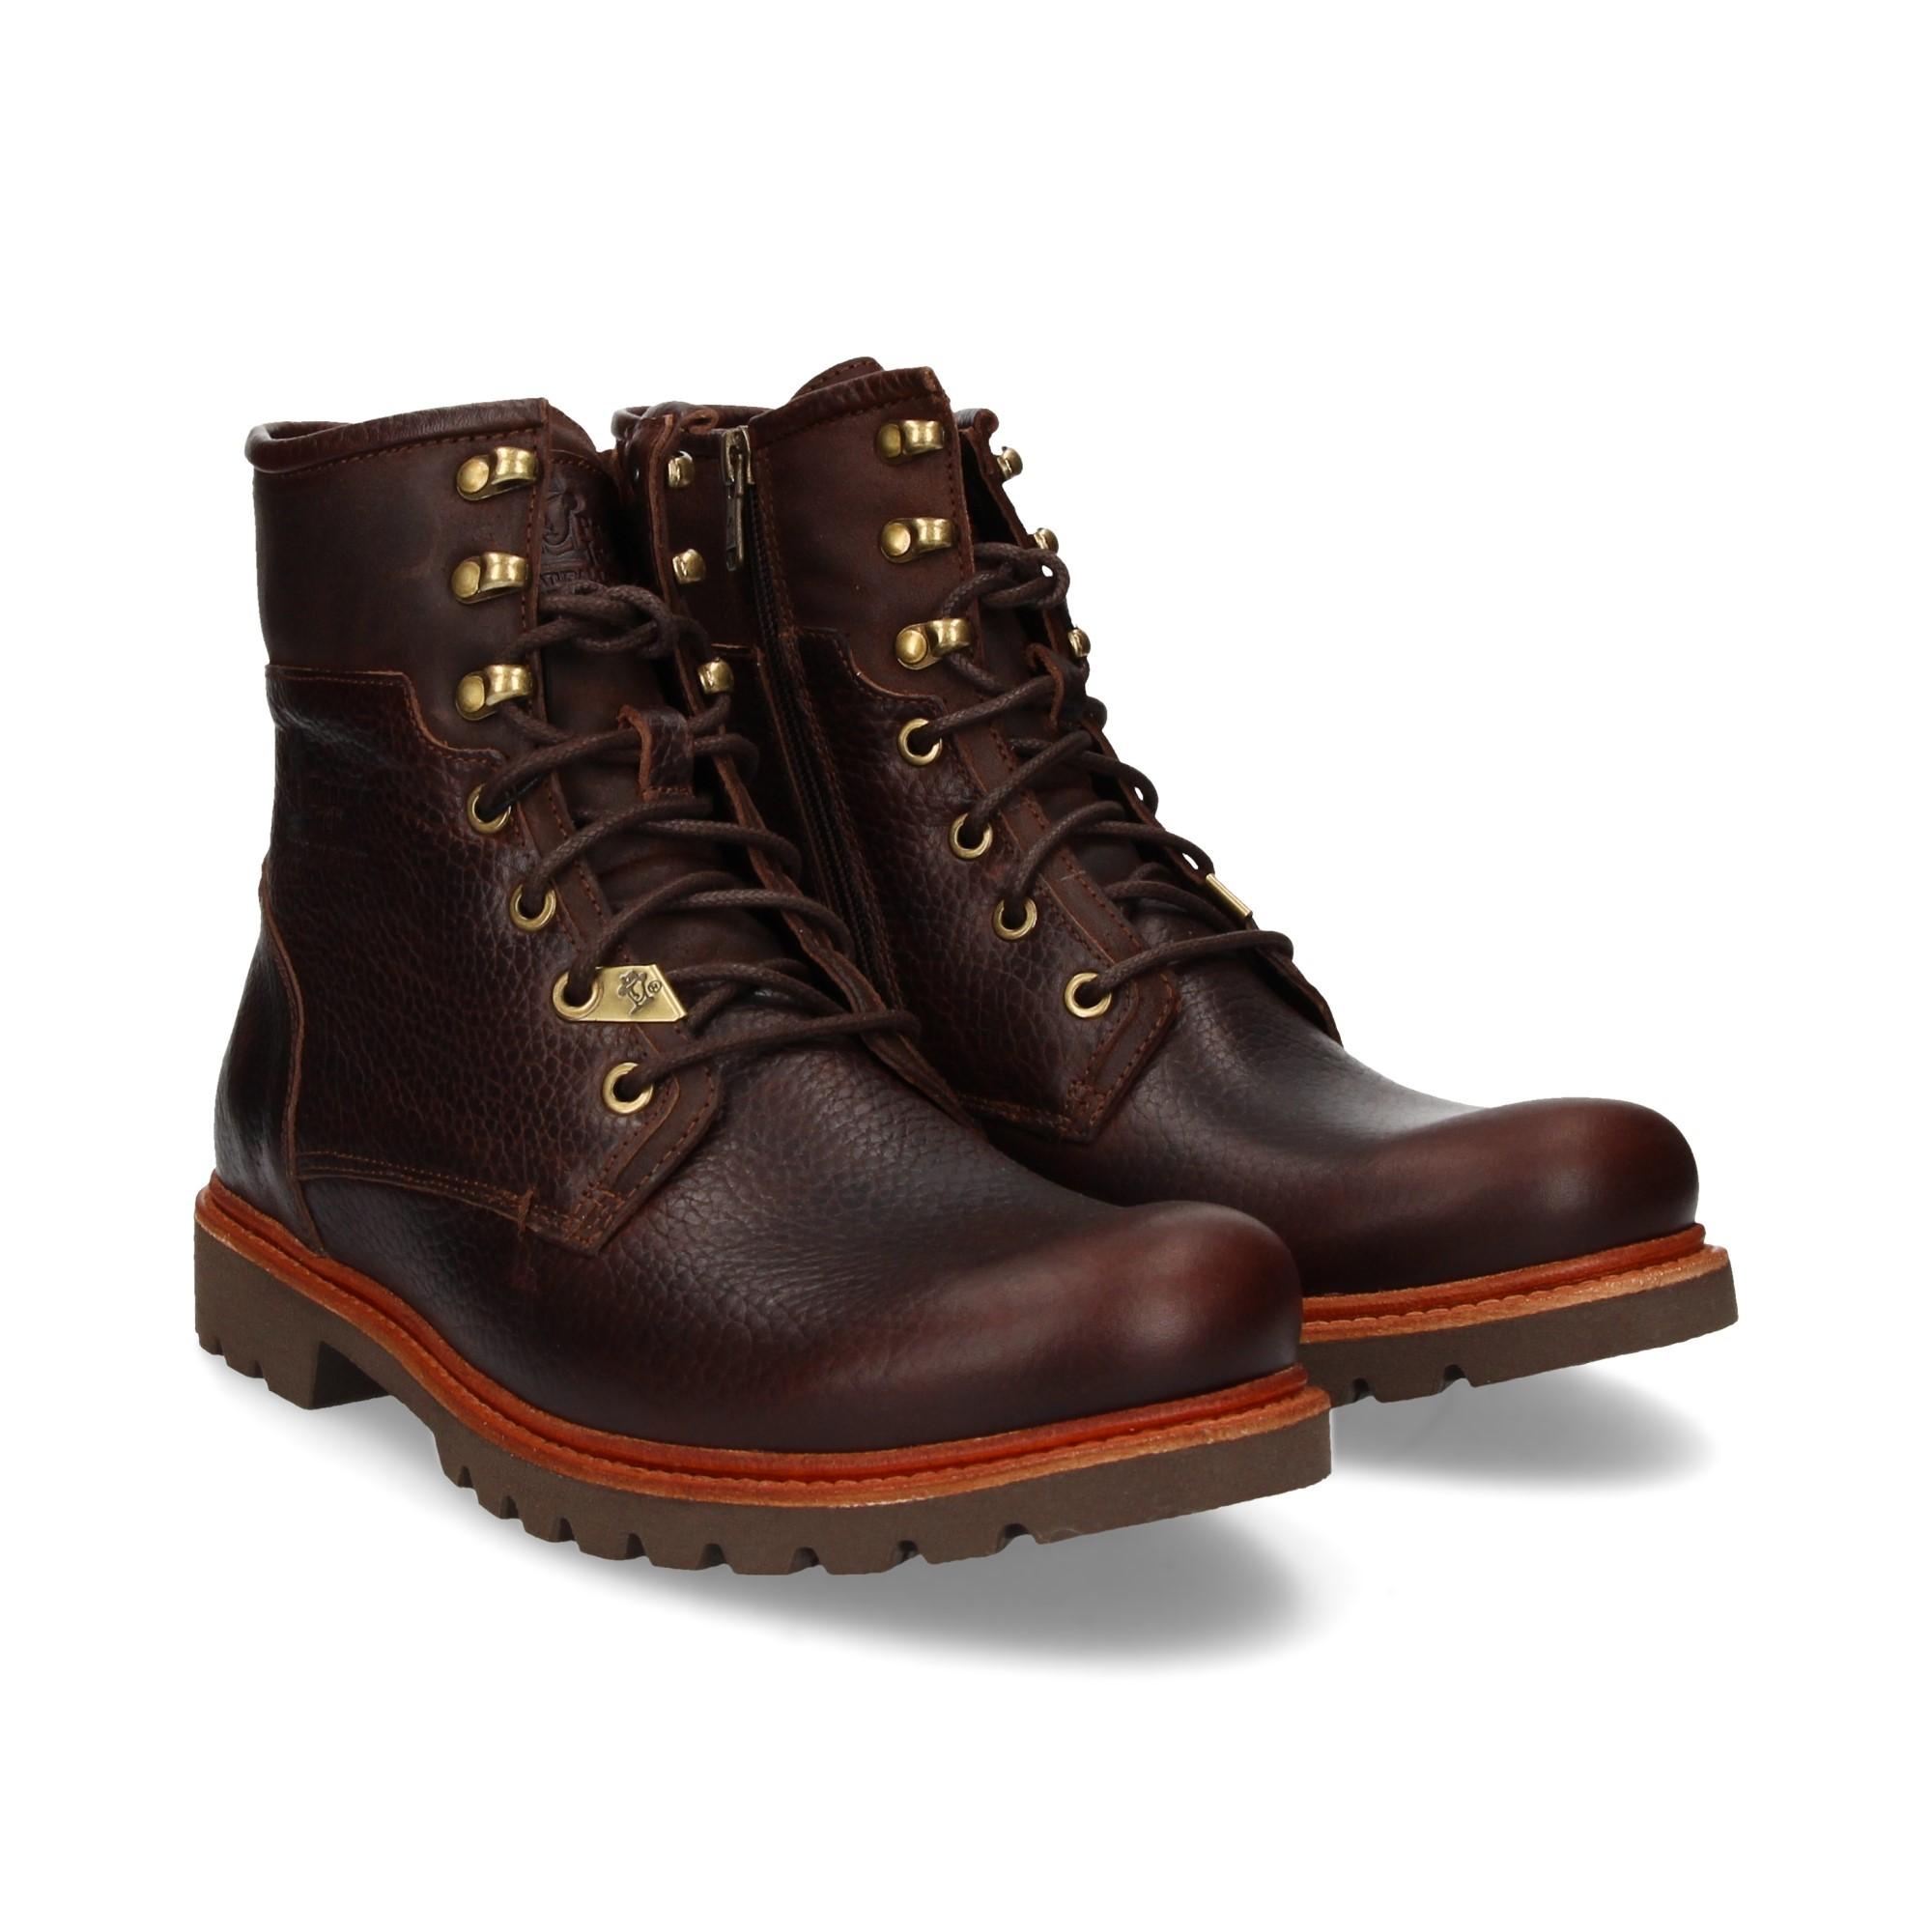 269cf1a821b0da PANAMA JACK Men s Ankle Boots BARKLEY C8 NAPA MARRON